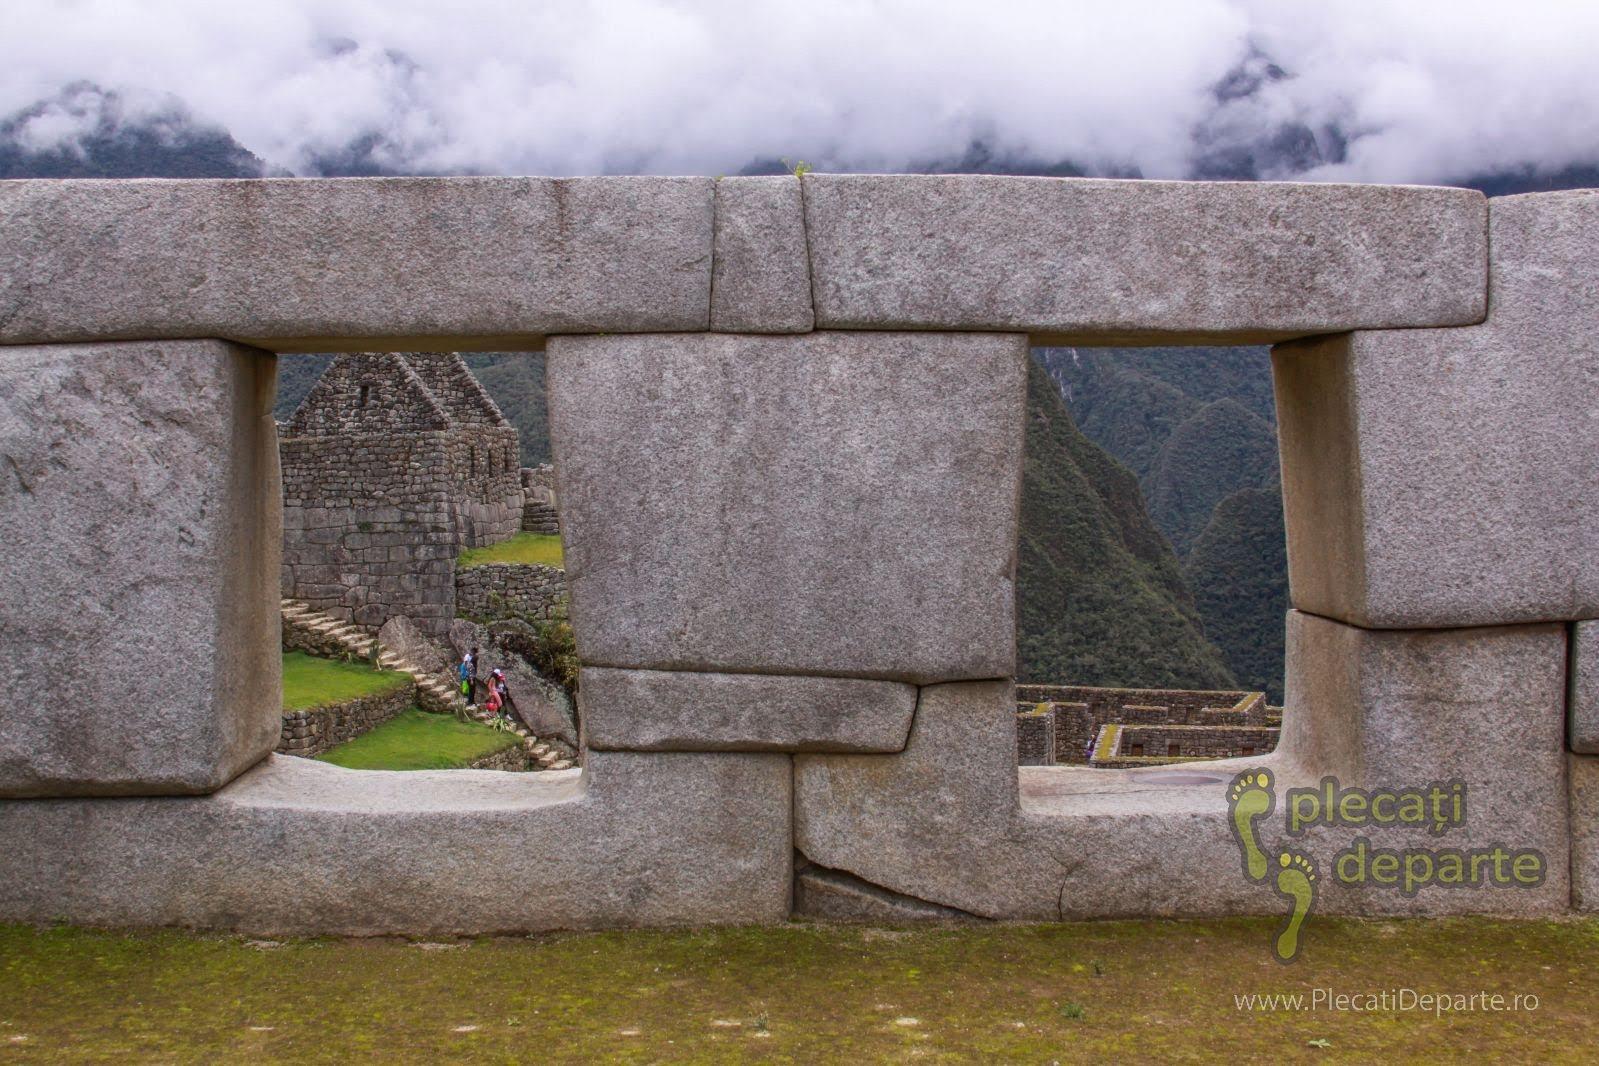 pietre imbinate perfect de catre incasi, fara nici un fel de liant, la Machu Picchu, in Peru